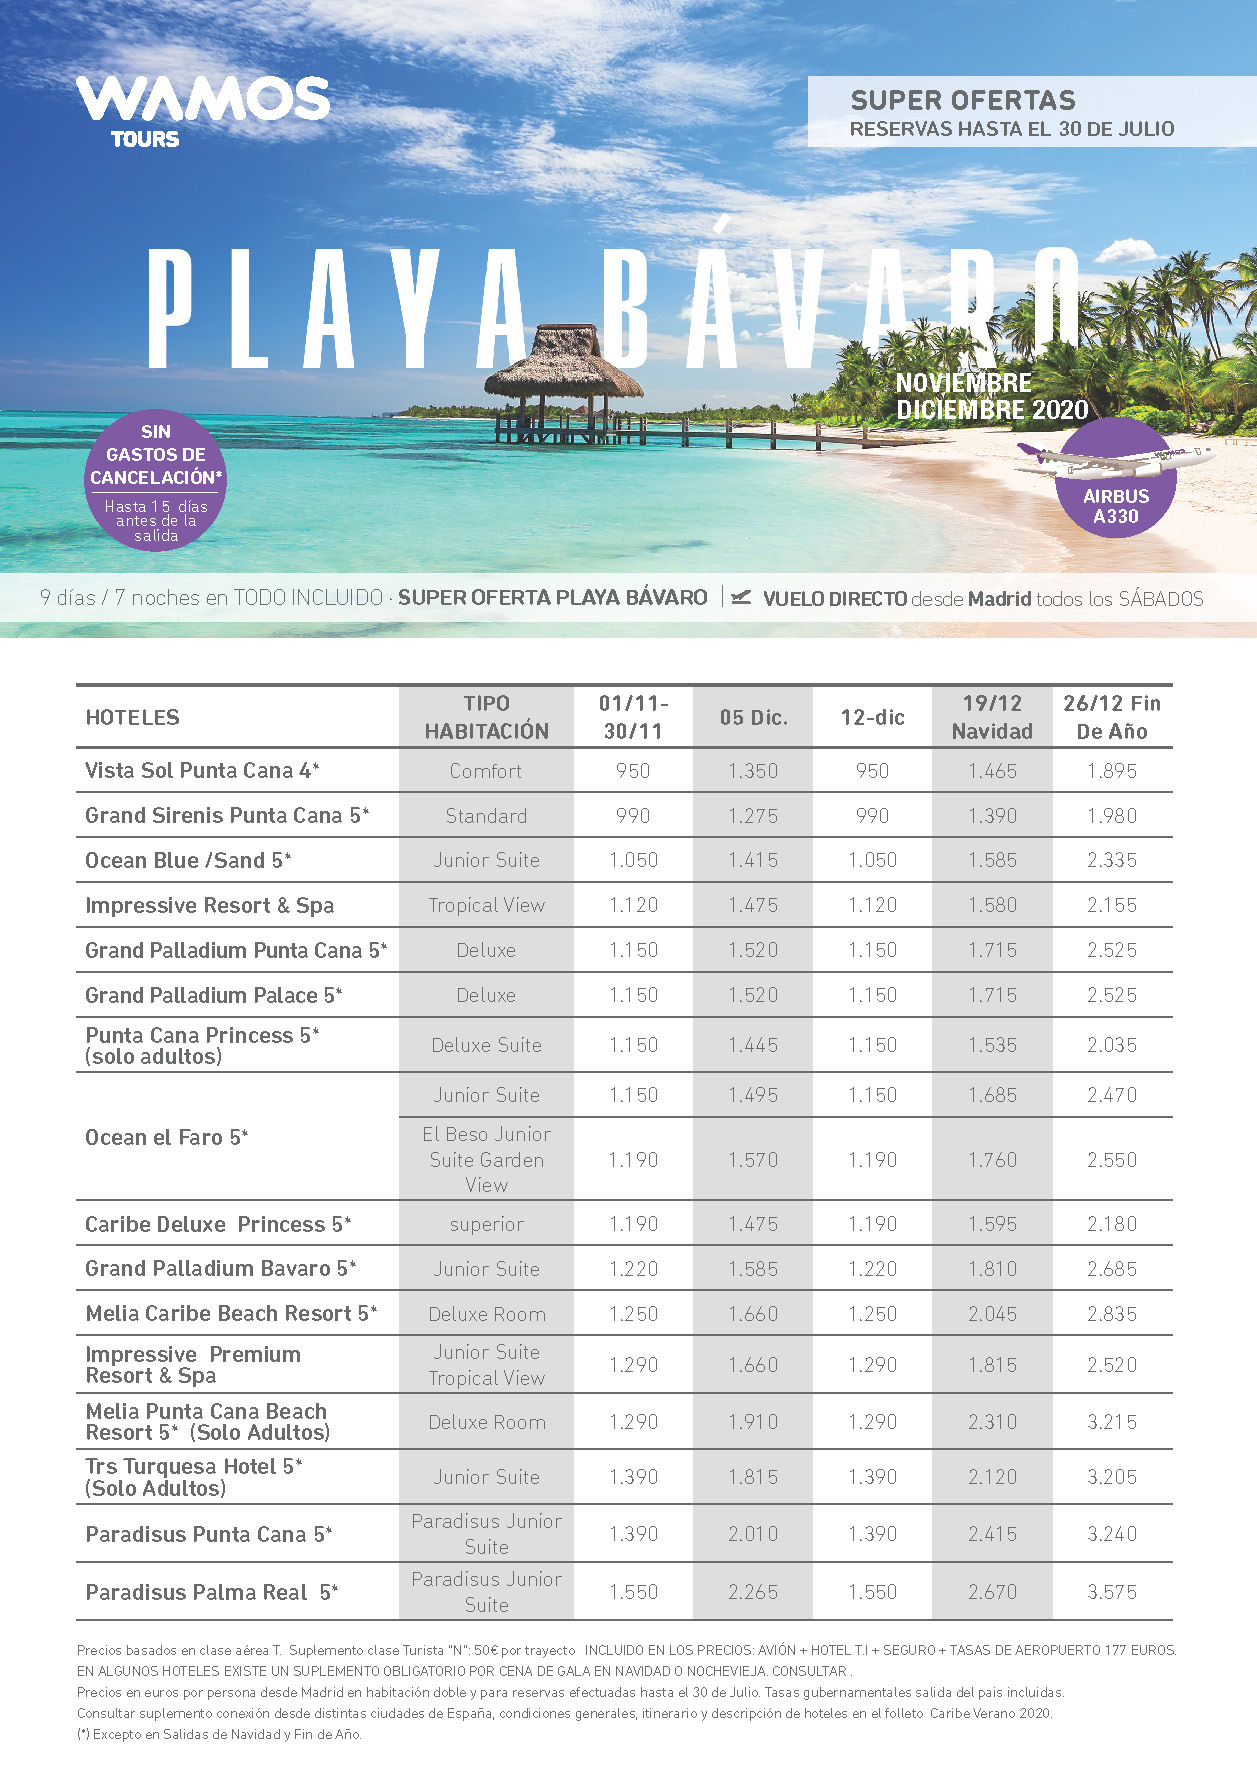 Oferta Wamos Tours Playa Bávaro Todo Incluido Noviembre-Diciembre 2020 salidas vuelo directo desde Madrid